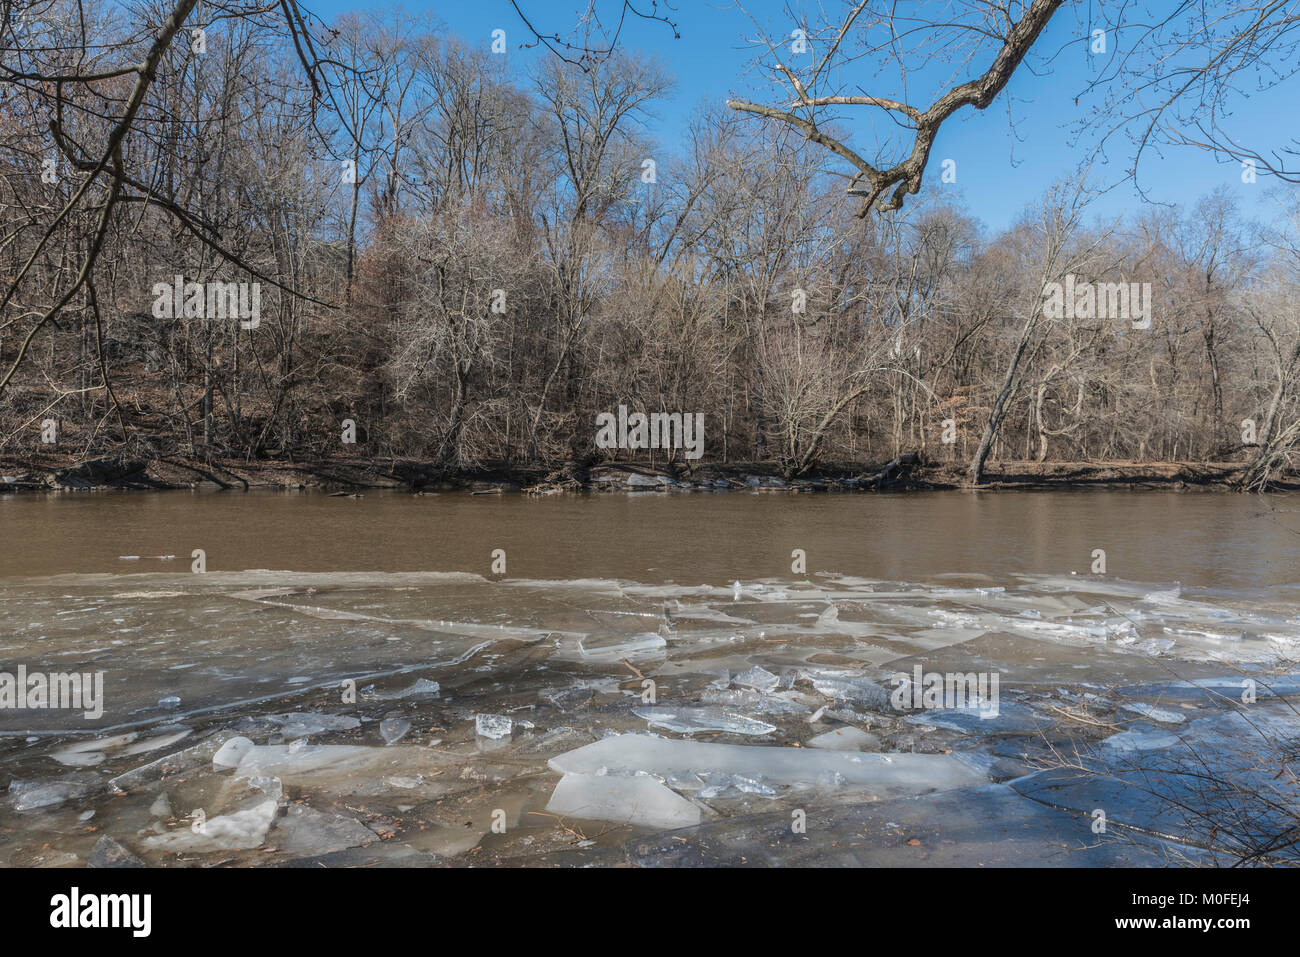 ice on the Brandywine Creek in Wilmington, Delaware - Stock Image